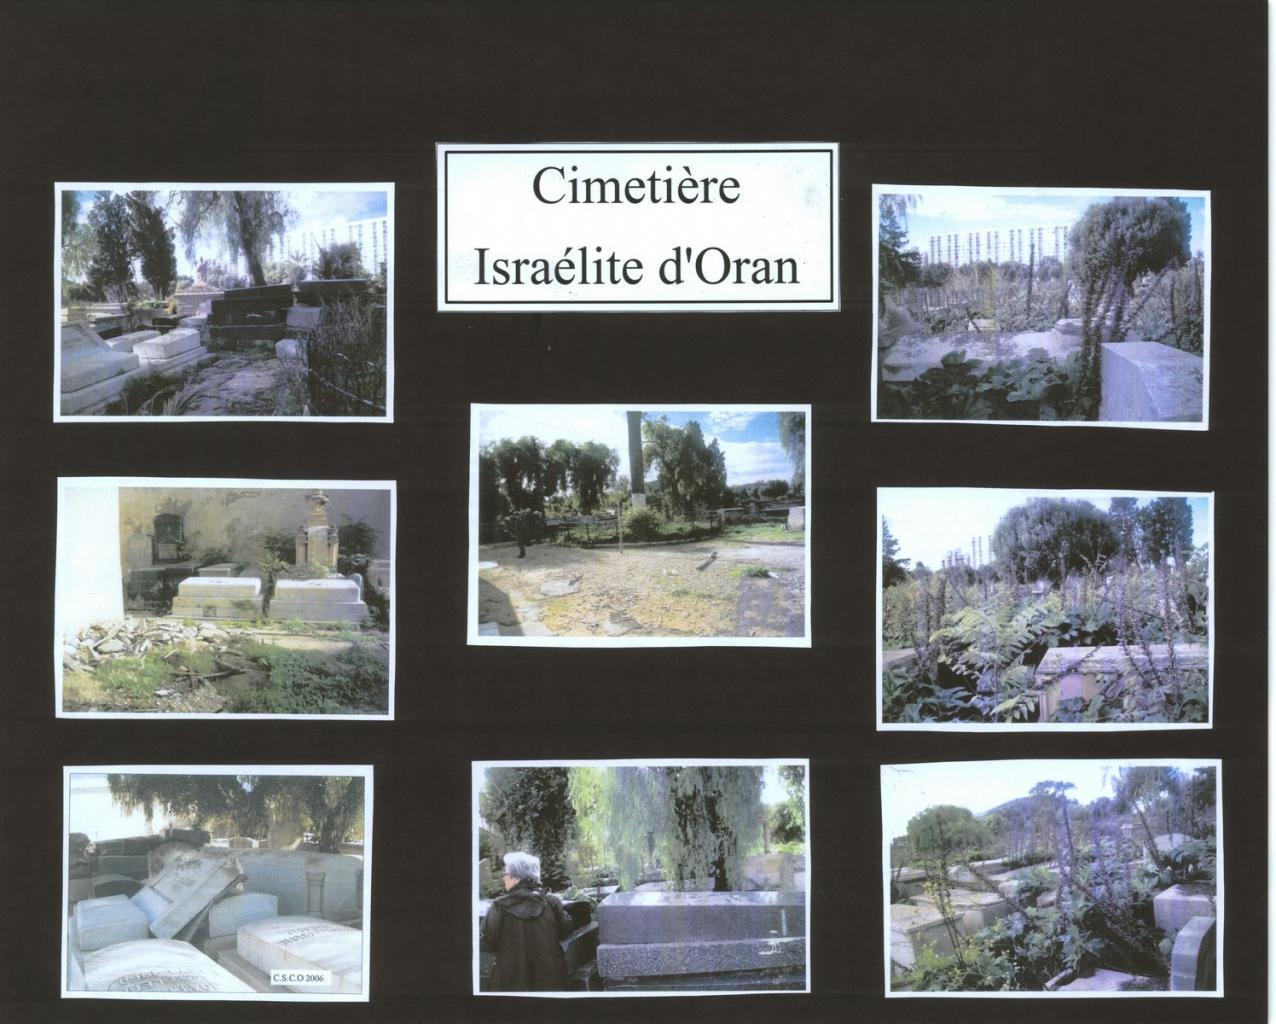 Oran Cimetière israélite